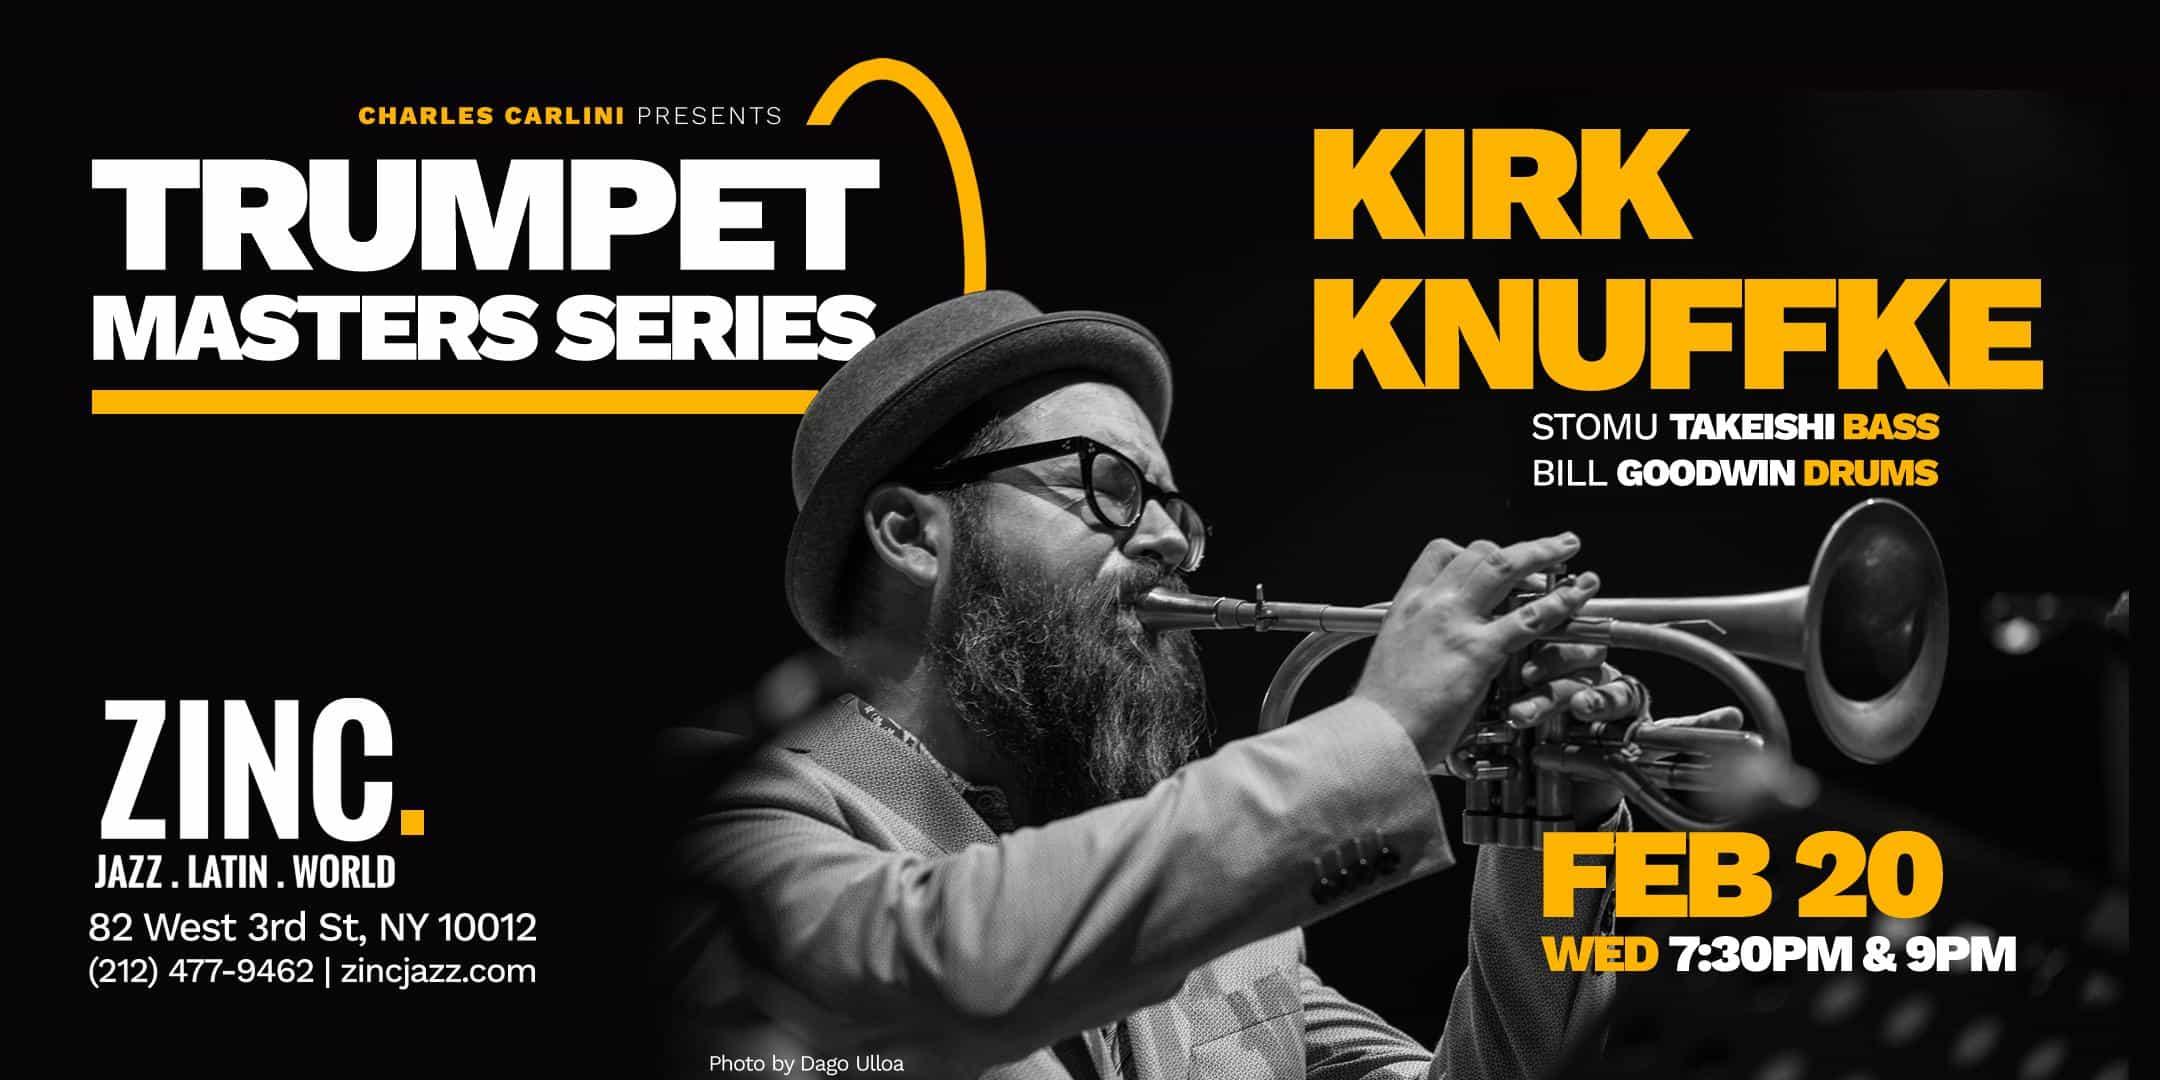 Trumpet Masters Series: Kirk Knuffke Trio